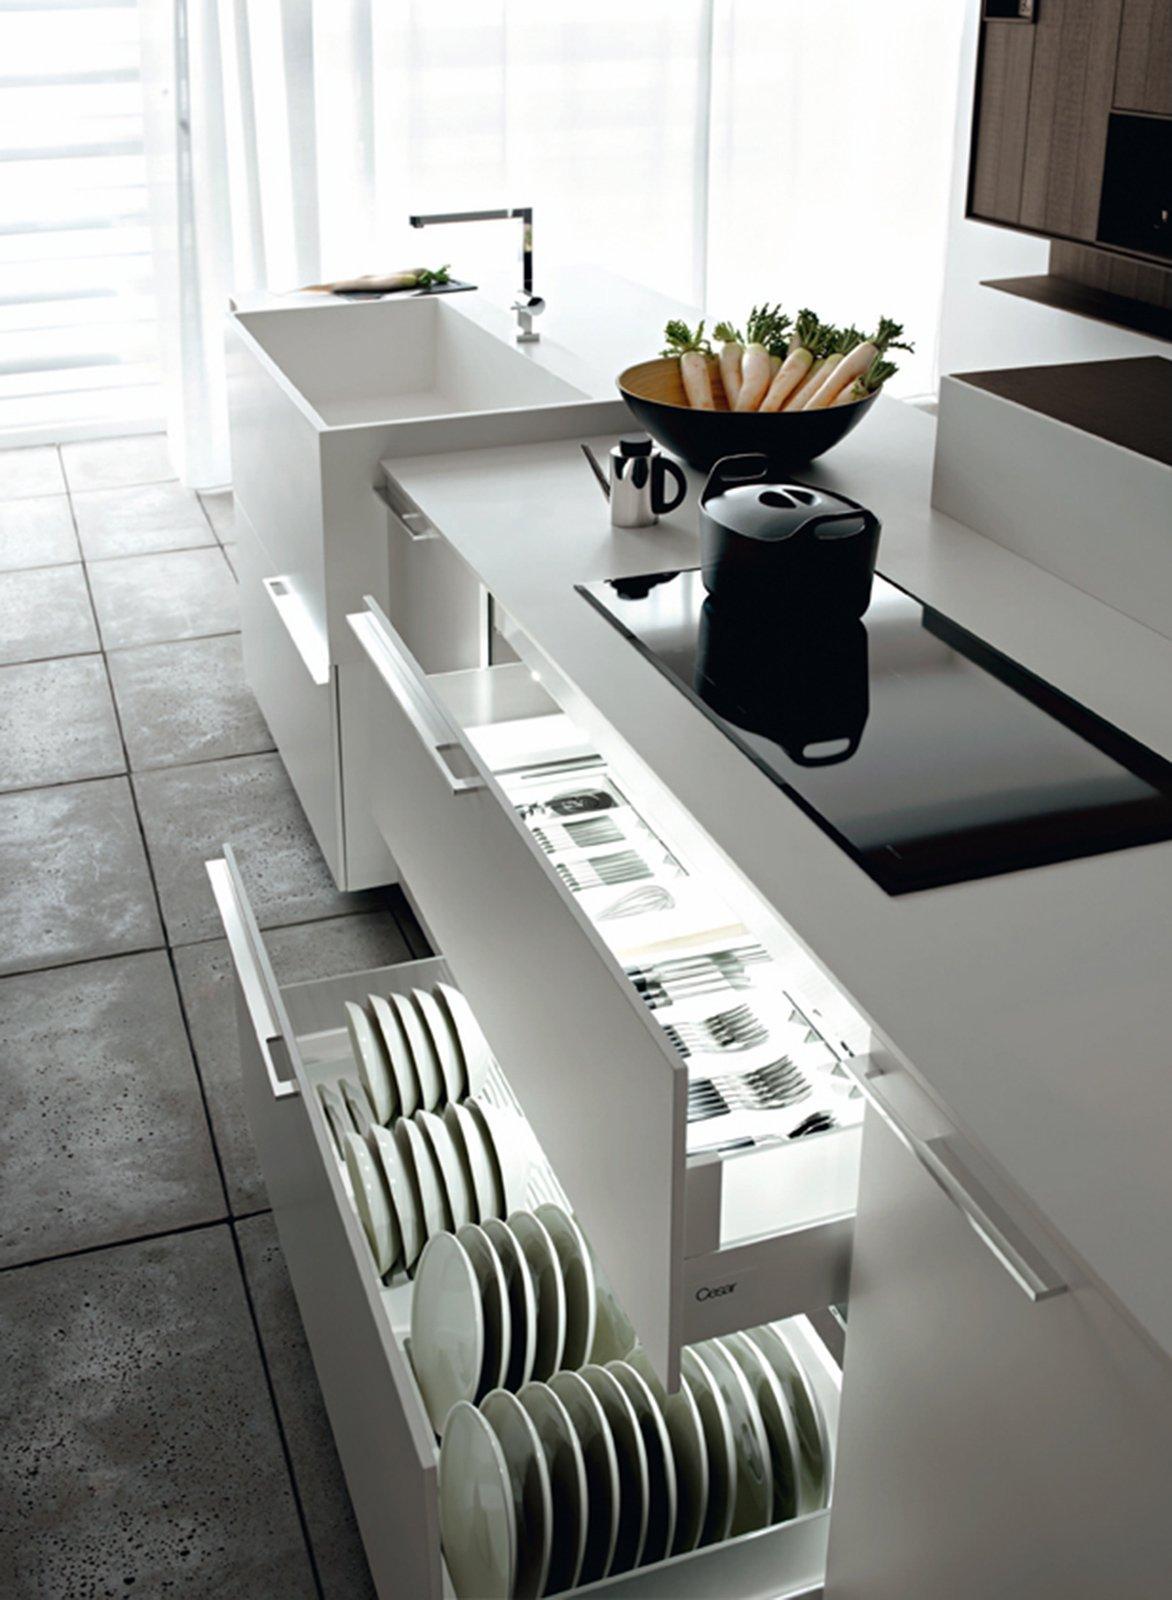 Cucina tante soluzioni per illuminarla cose di casa for Led per cucina